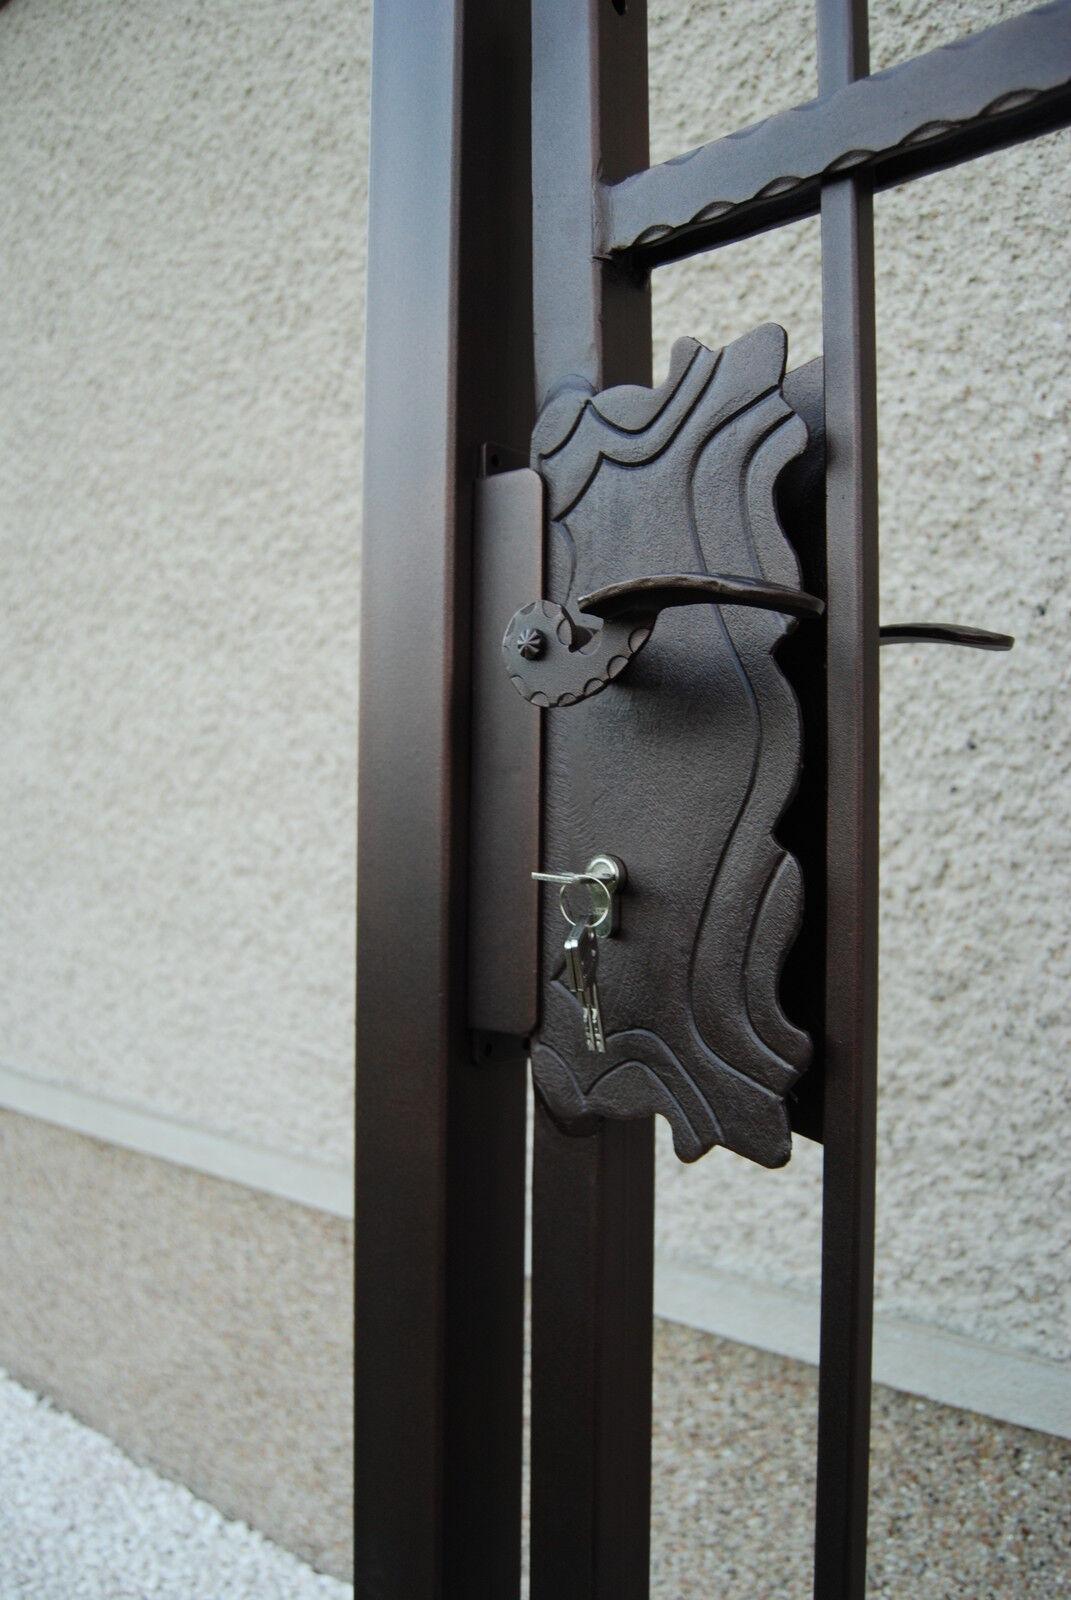 schmiedeeisernes gartentor pforte schmiedetor eingangstor kupfer rost eur 420 00 picclick de. Black Bedroom Furniture Sets. Home Design Ideas